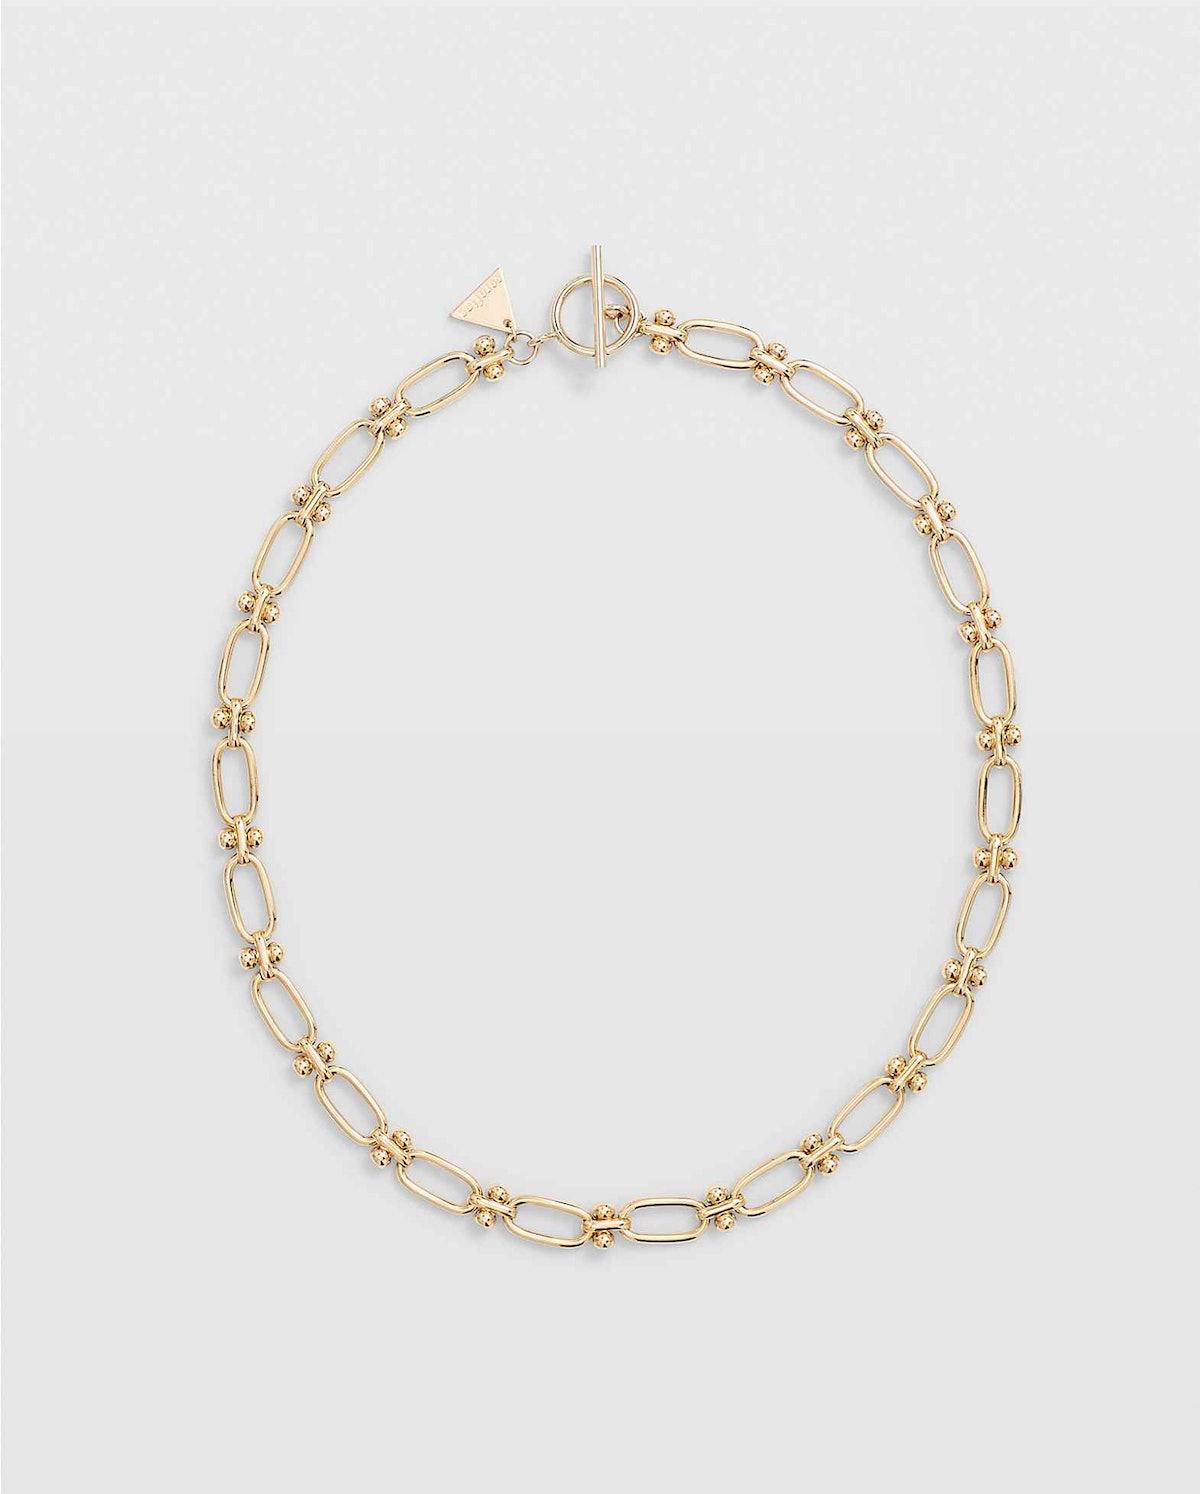 Serefina Chain Link Necklace